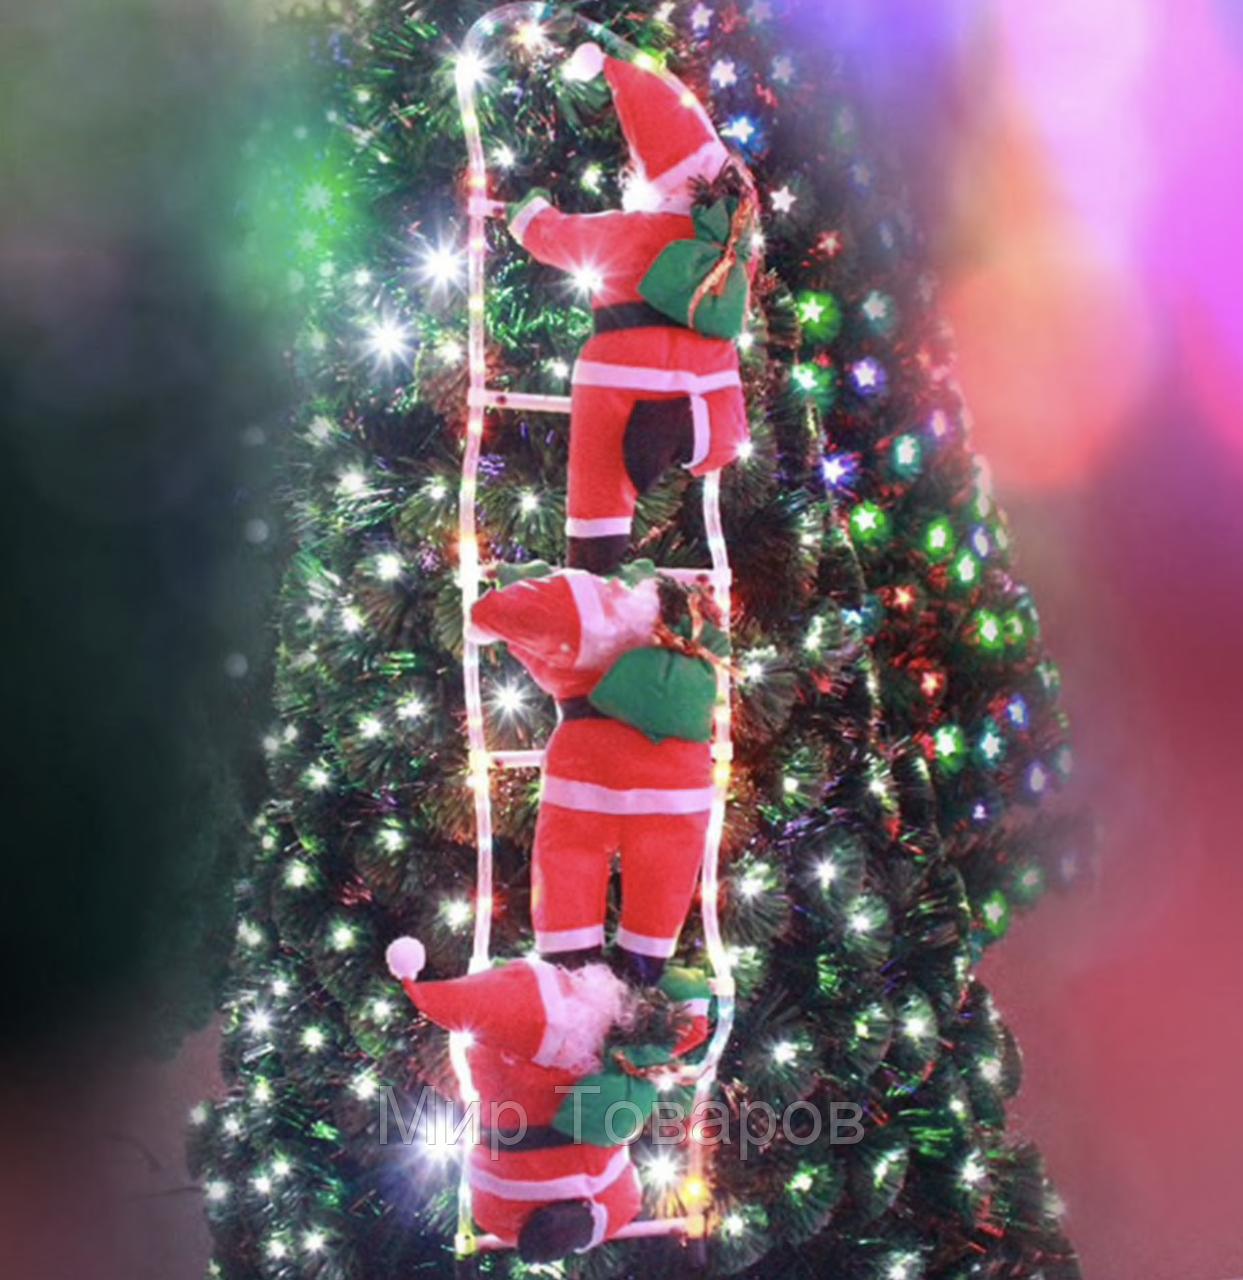 Декоративный Дед Мороз ползущий по лестнице (Санта Клаус на лестнице) 3 фигурки по 35см